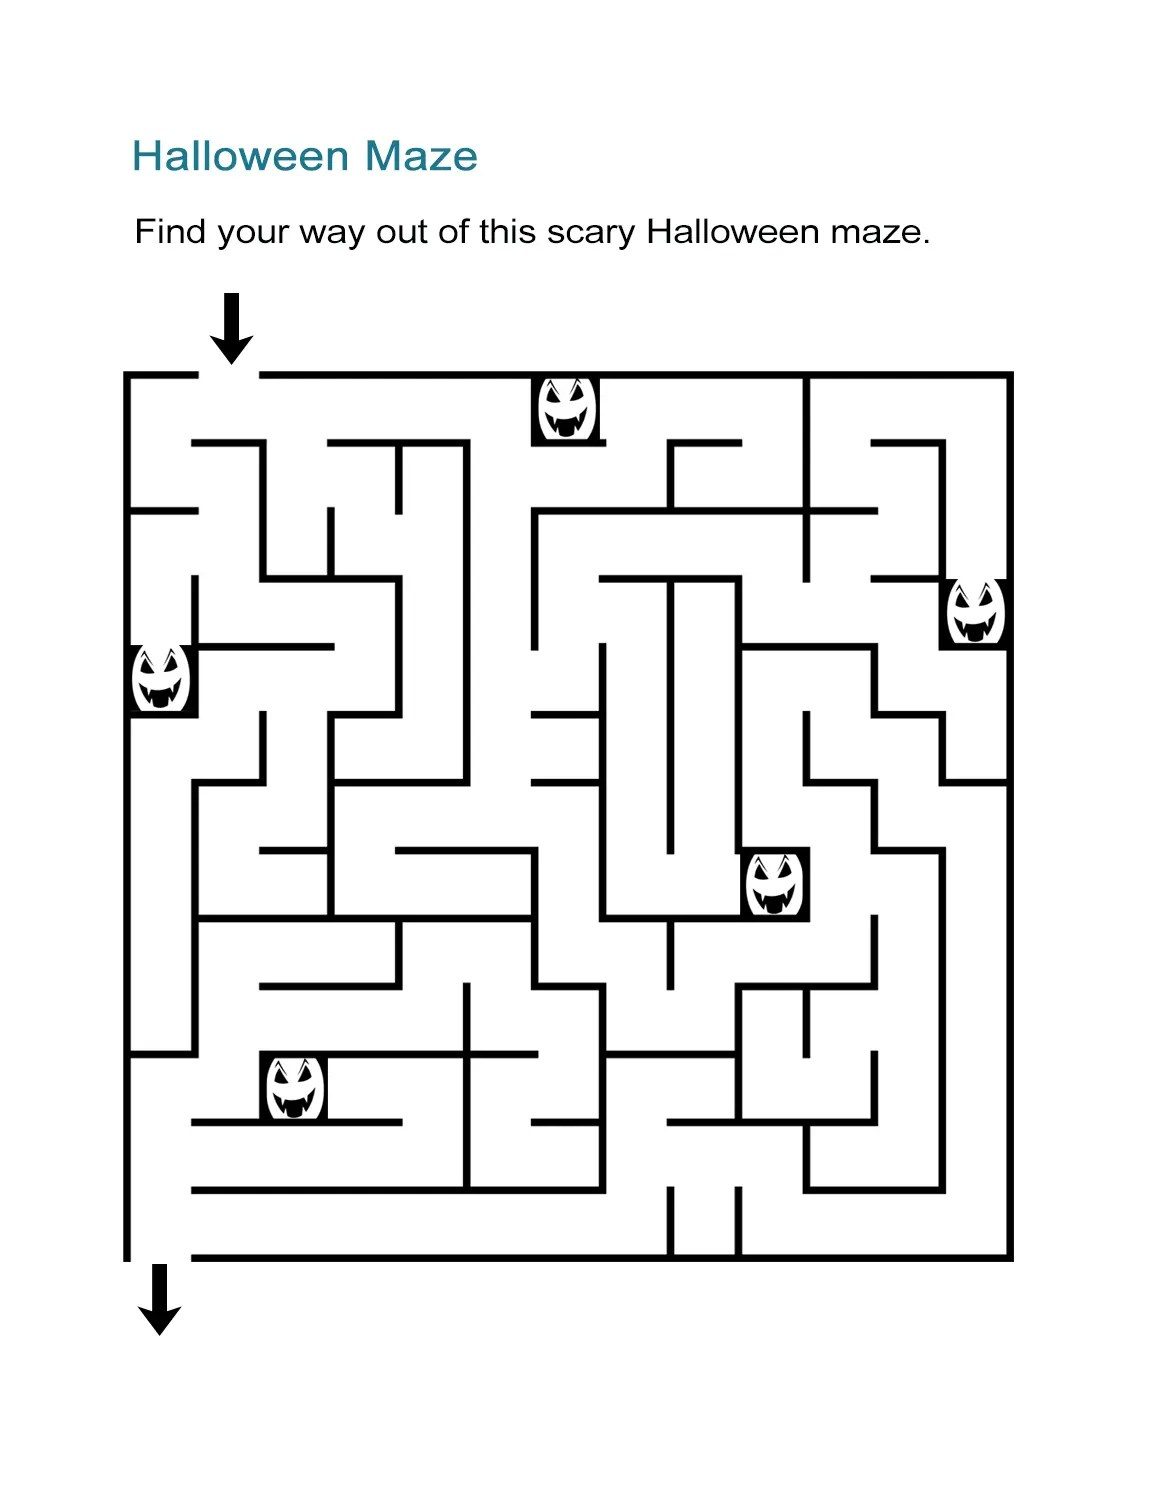 Halloween Maze Printable